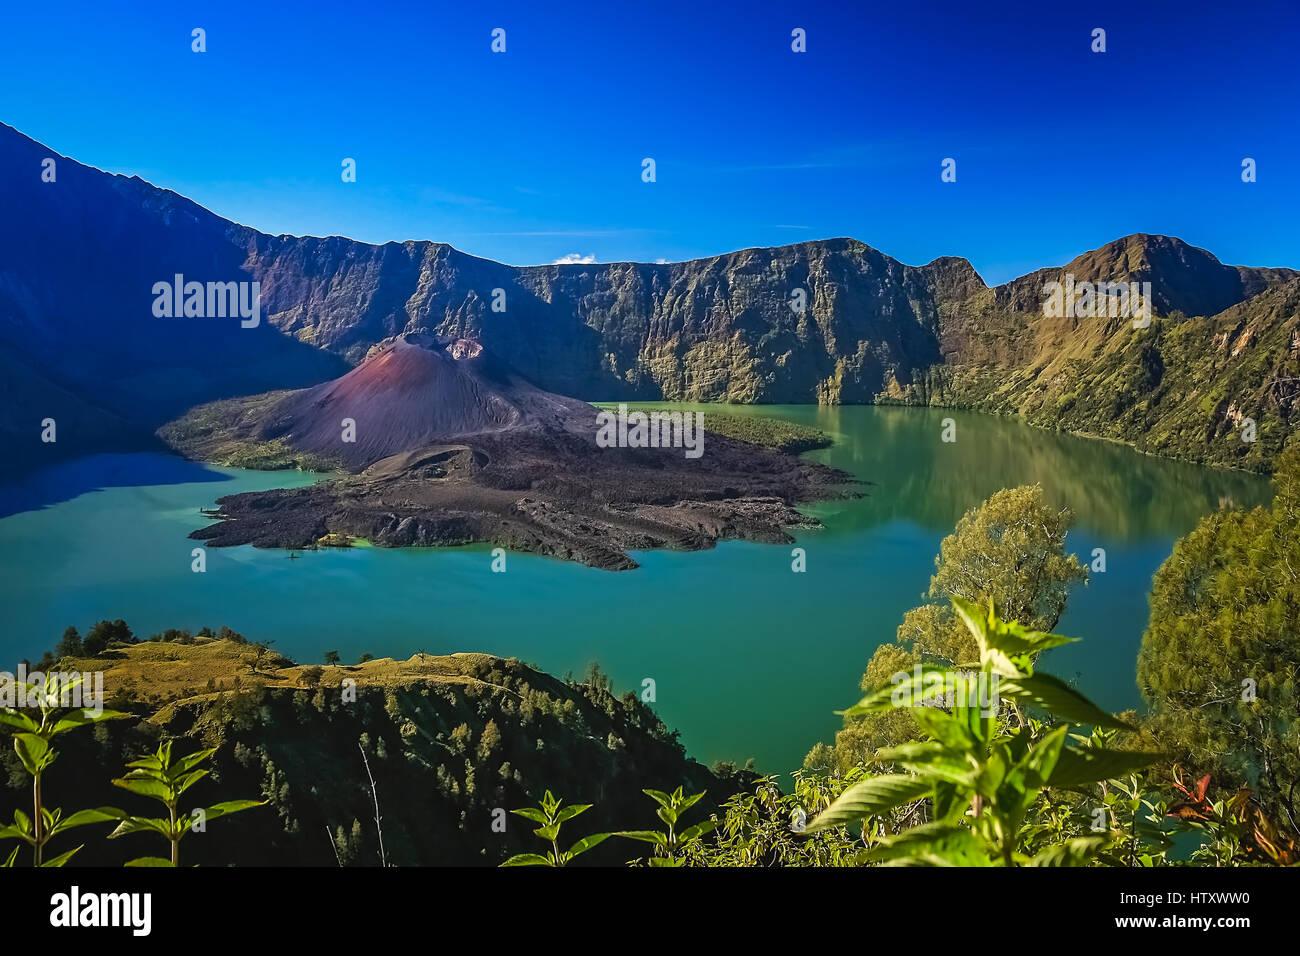 Crater of Gunung Rinjani volcano on the Lombok island, Indonesia - Stock Image